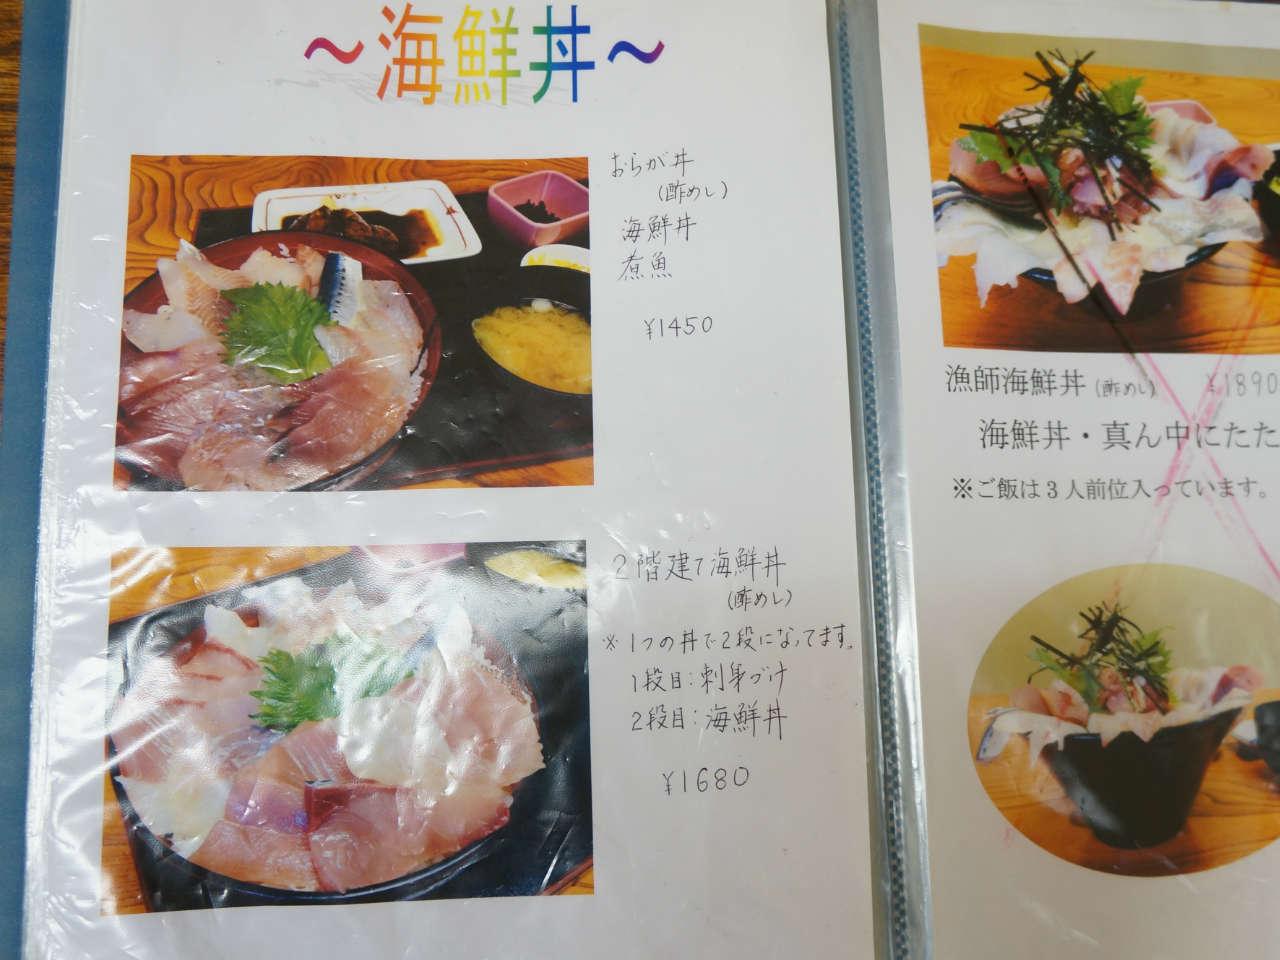 kamogawa-oragadon-funayoshi-m2